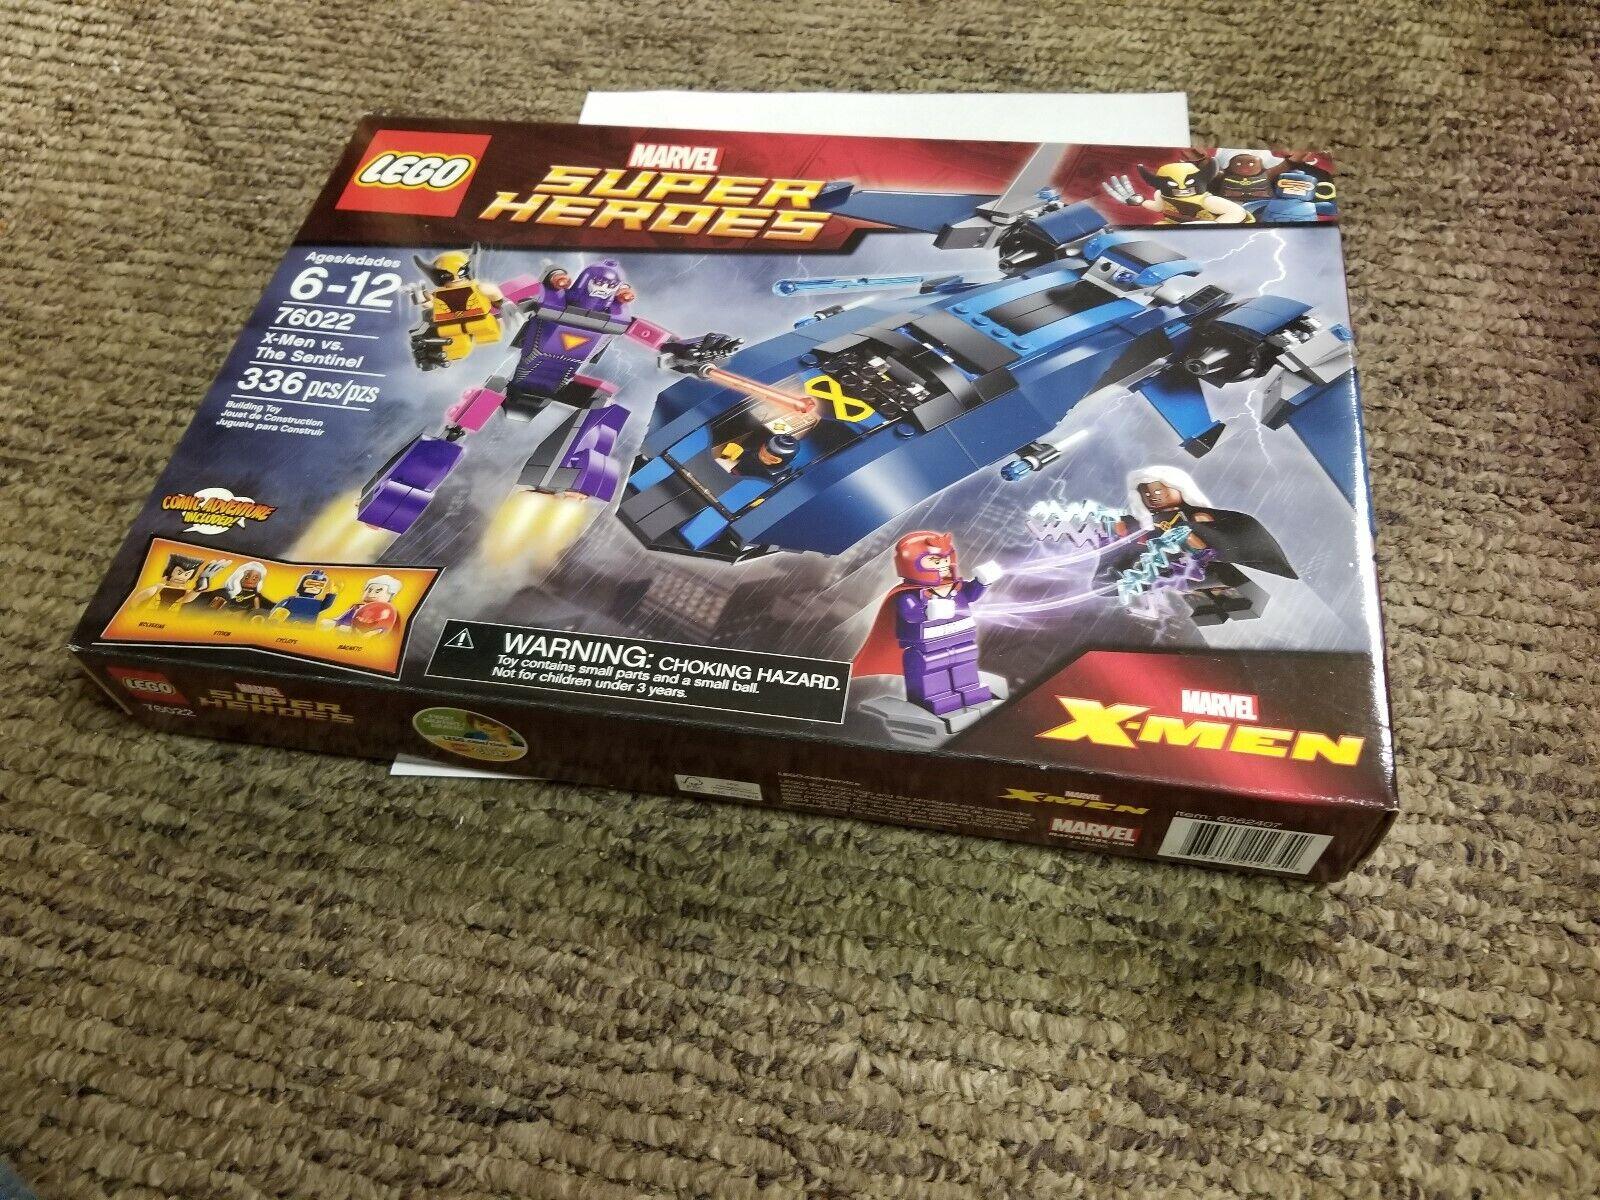 LEGO Marvel Superheroes - X-Men vs. The Sentinel 76022 Factory Sealed set